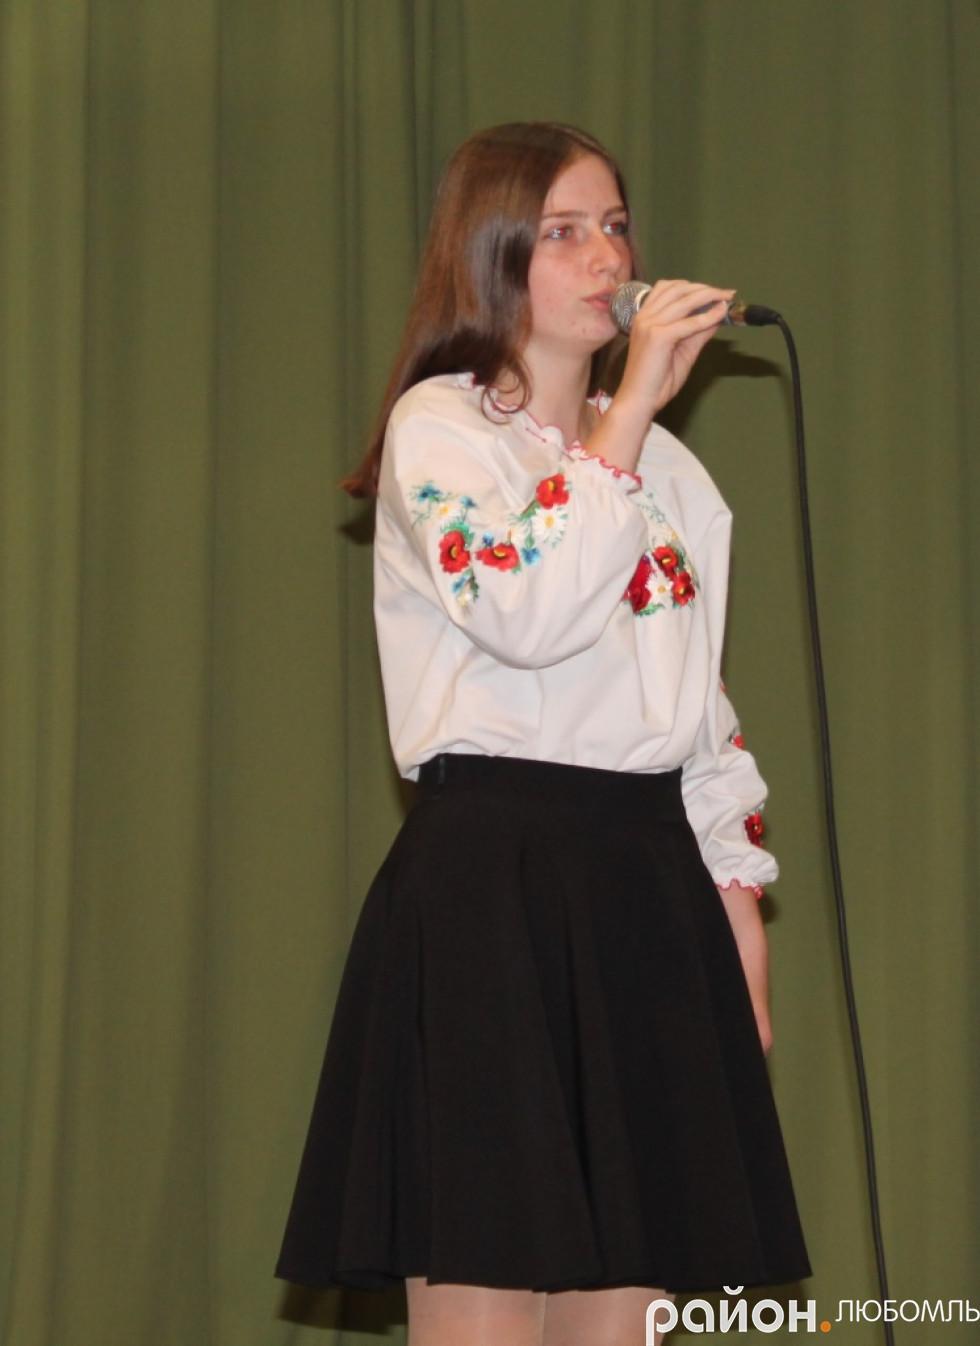 Дарина Пикалюк (ЗОШ №3 м. Любомль)